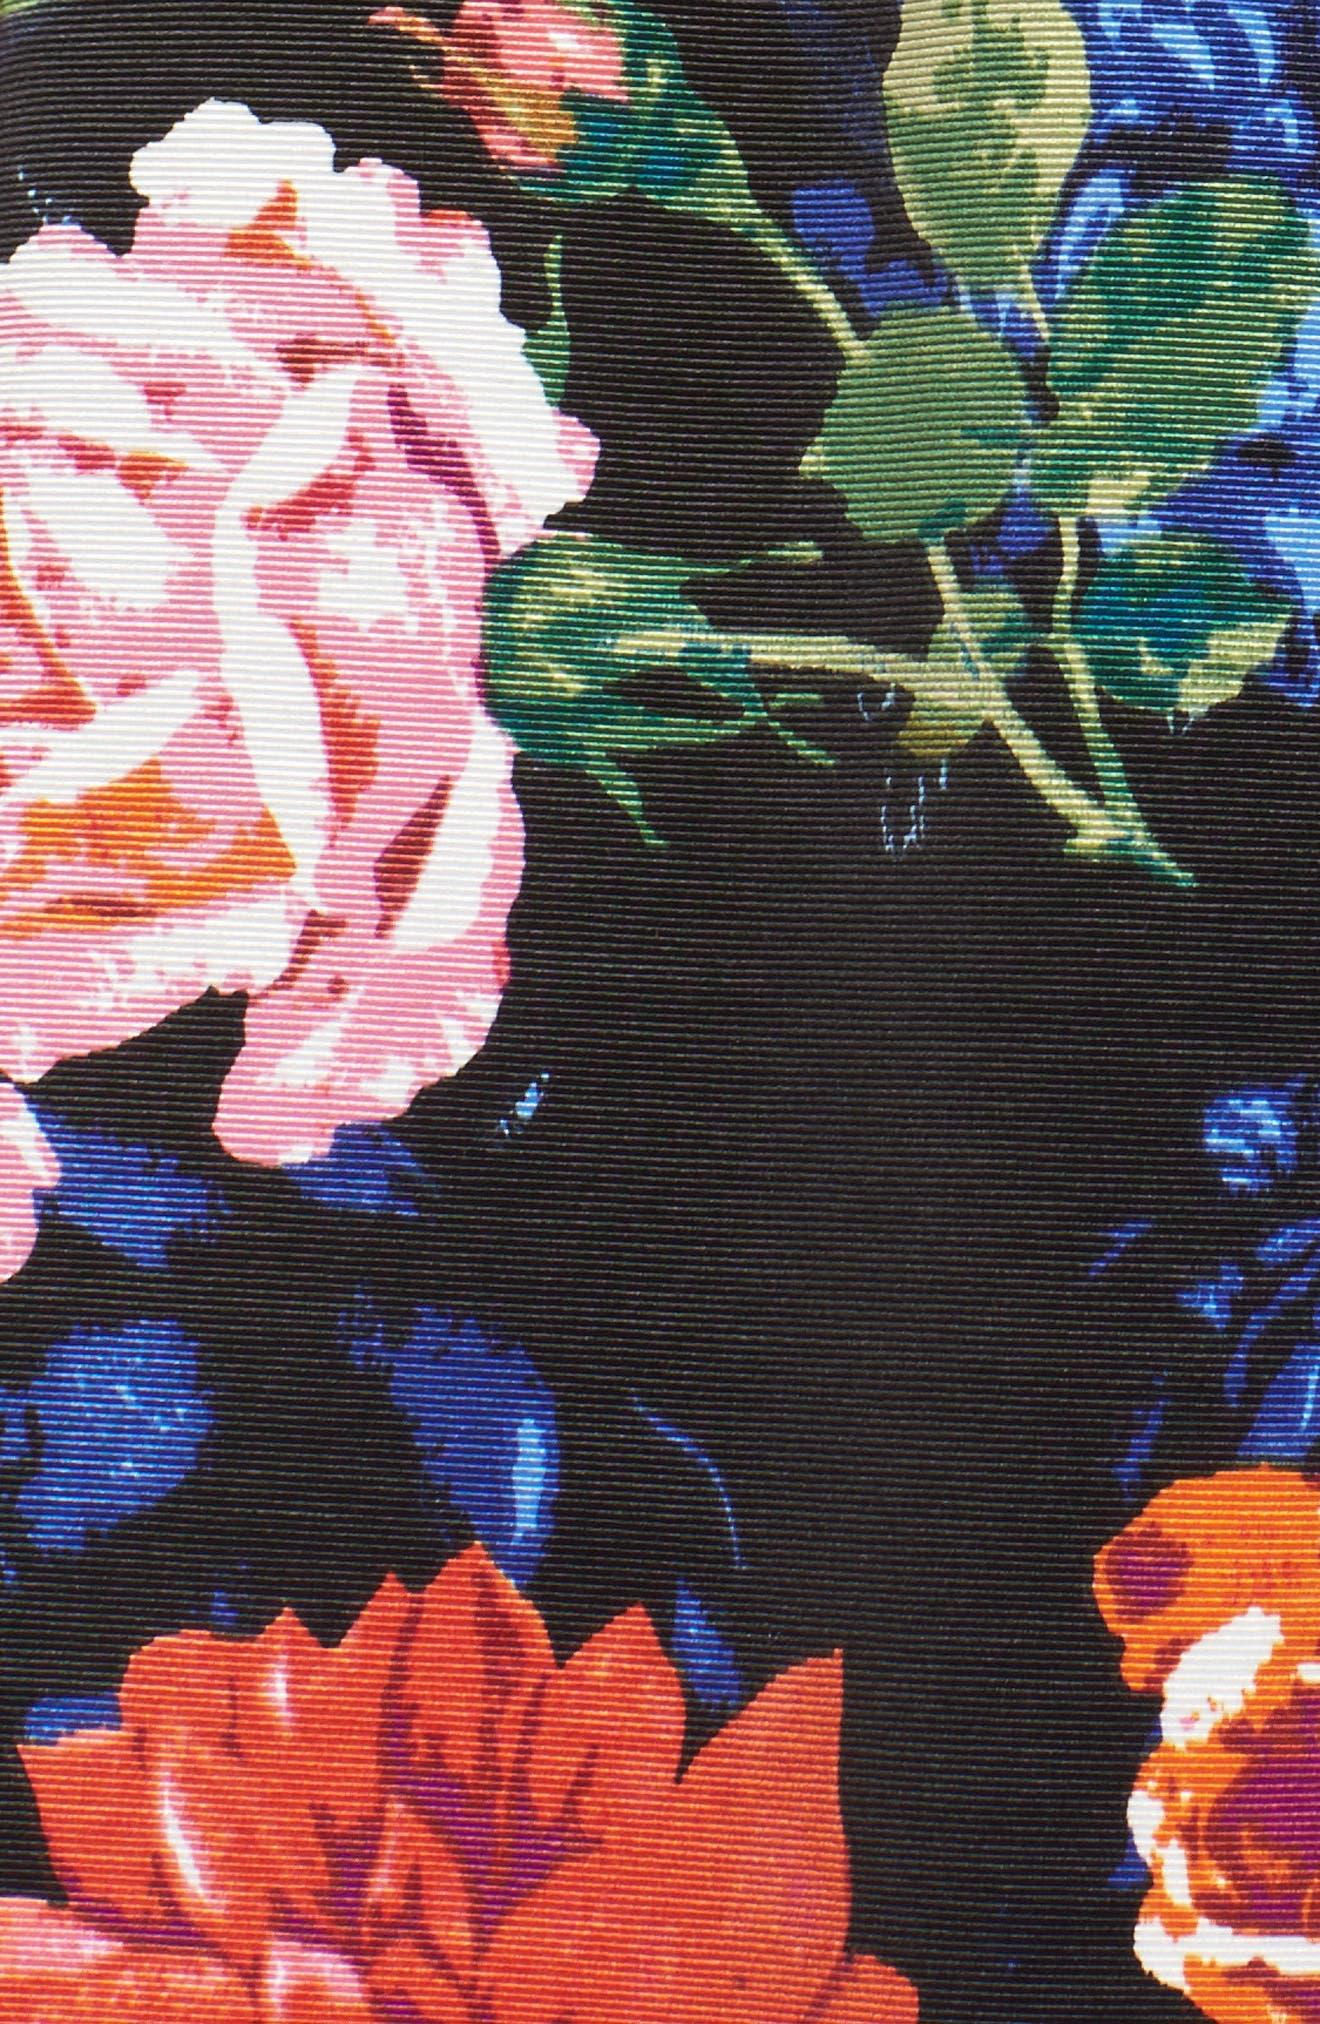 Floral Midi Skirt,                             Alternate thumbnail 5, color,                             Black/ Pink